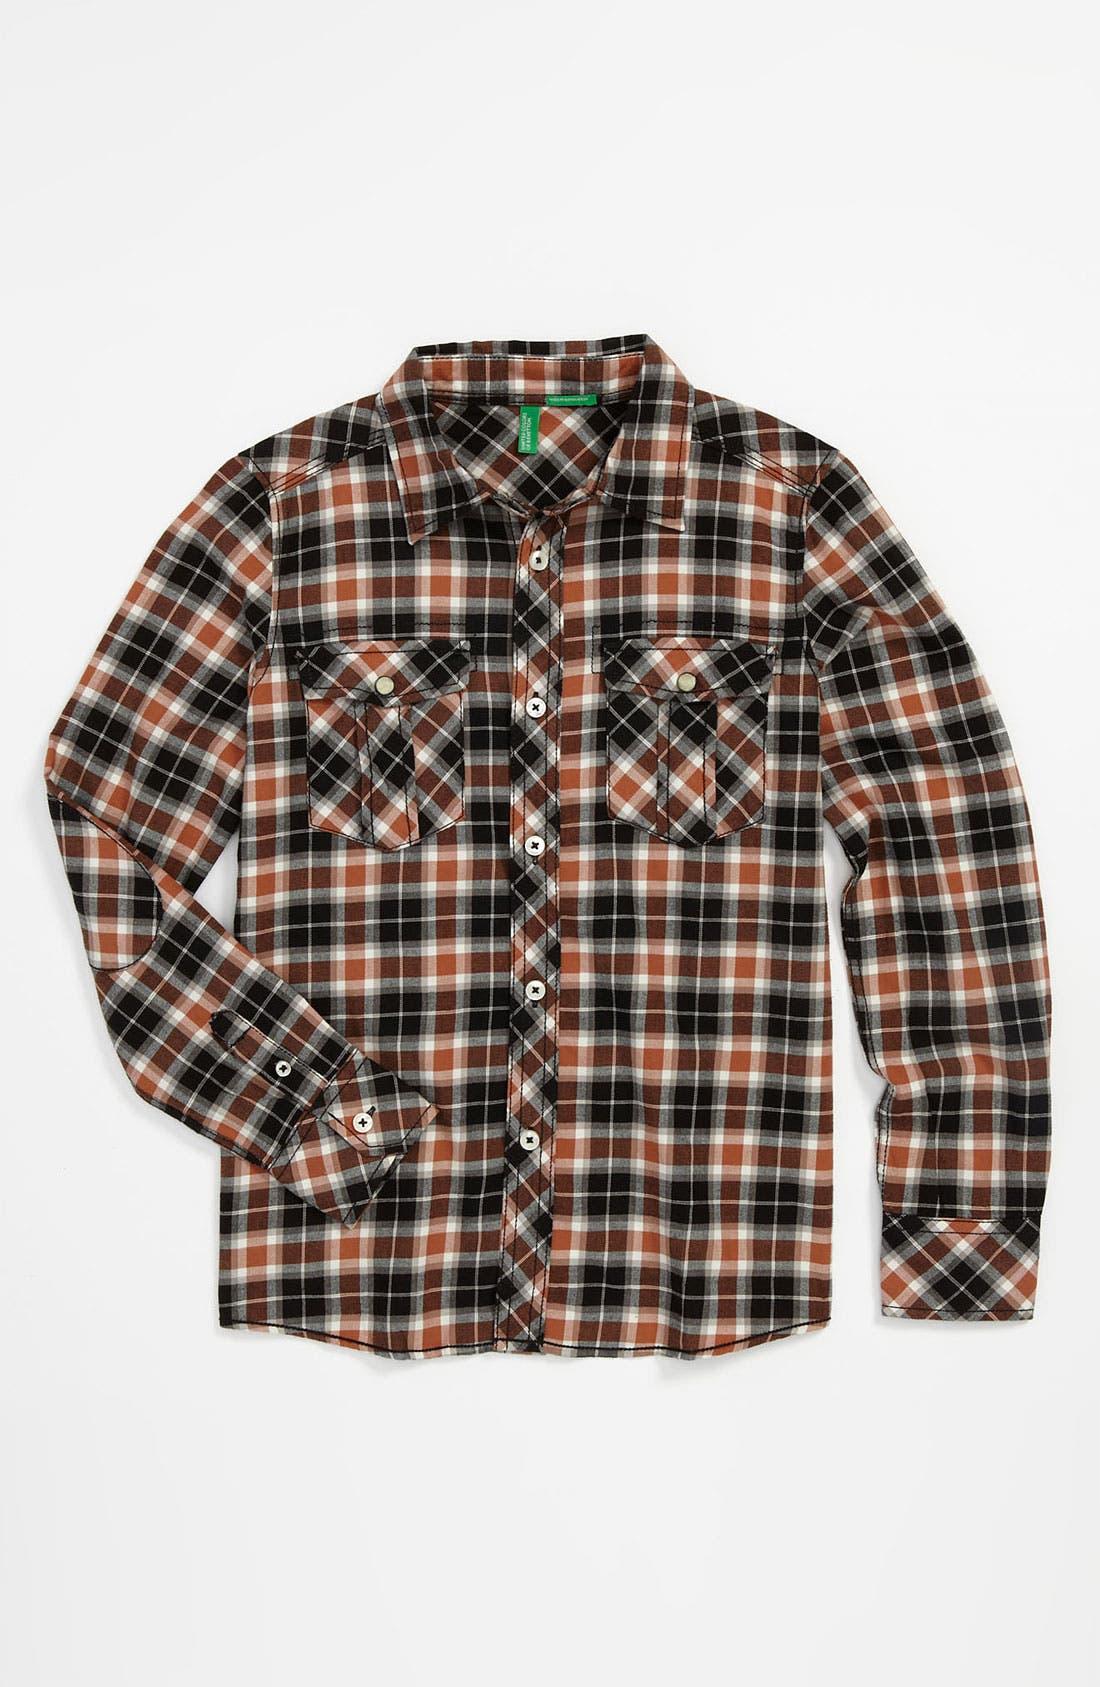 Alternate Image 1 Selected - United Colors of Benetton Kids Plaid Woven Shirt (Little Boys & Big Boys)